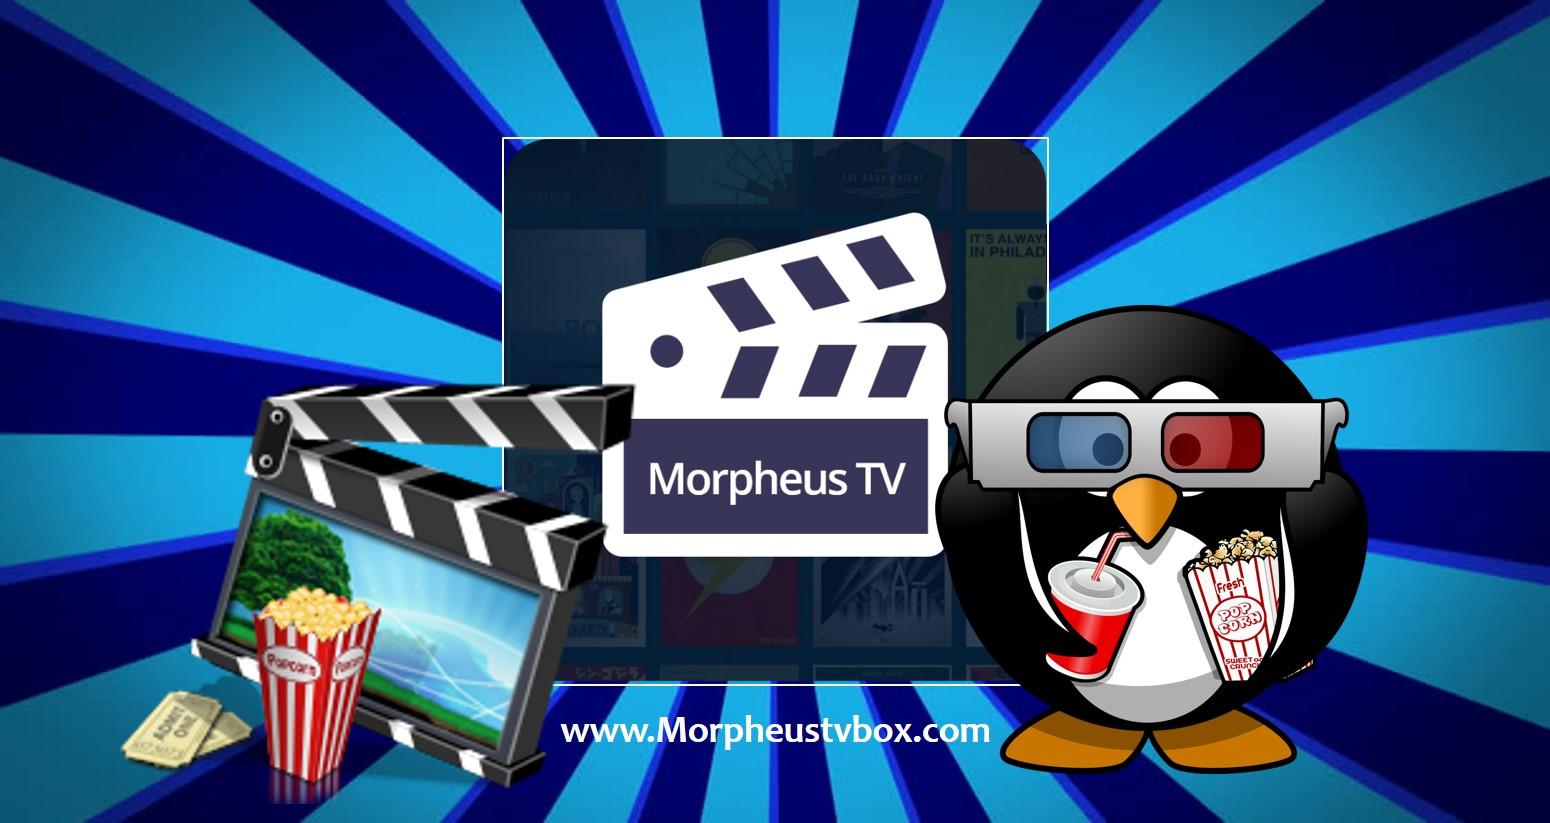 morpheus tv app official